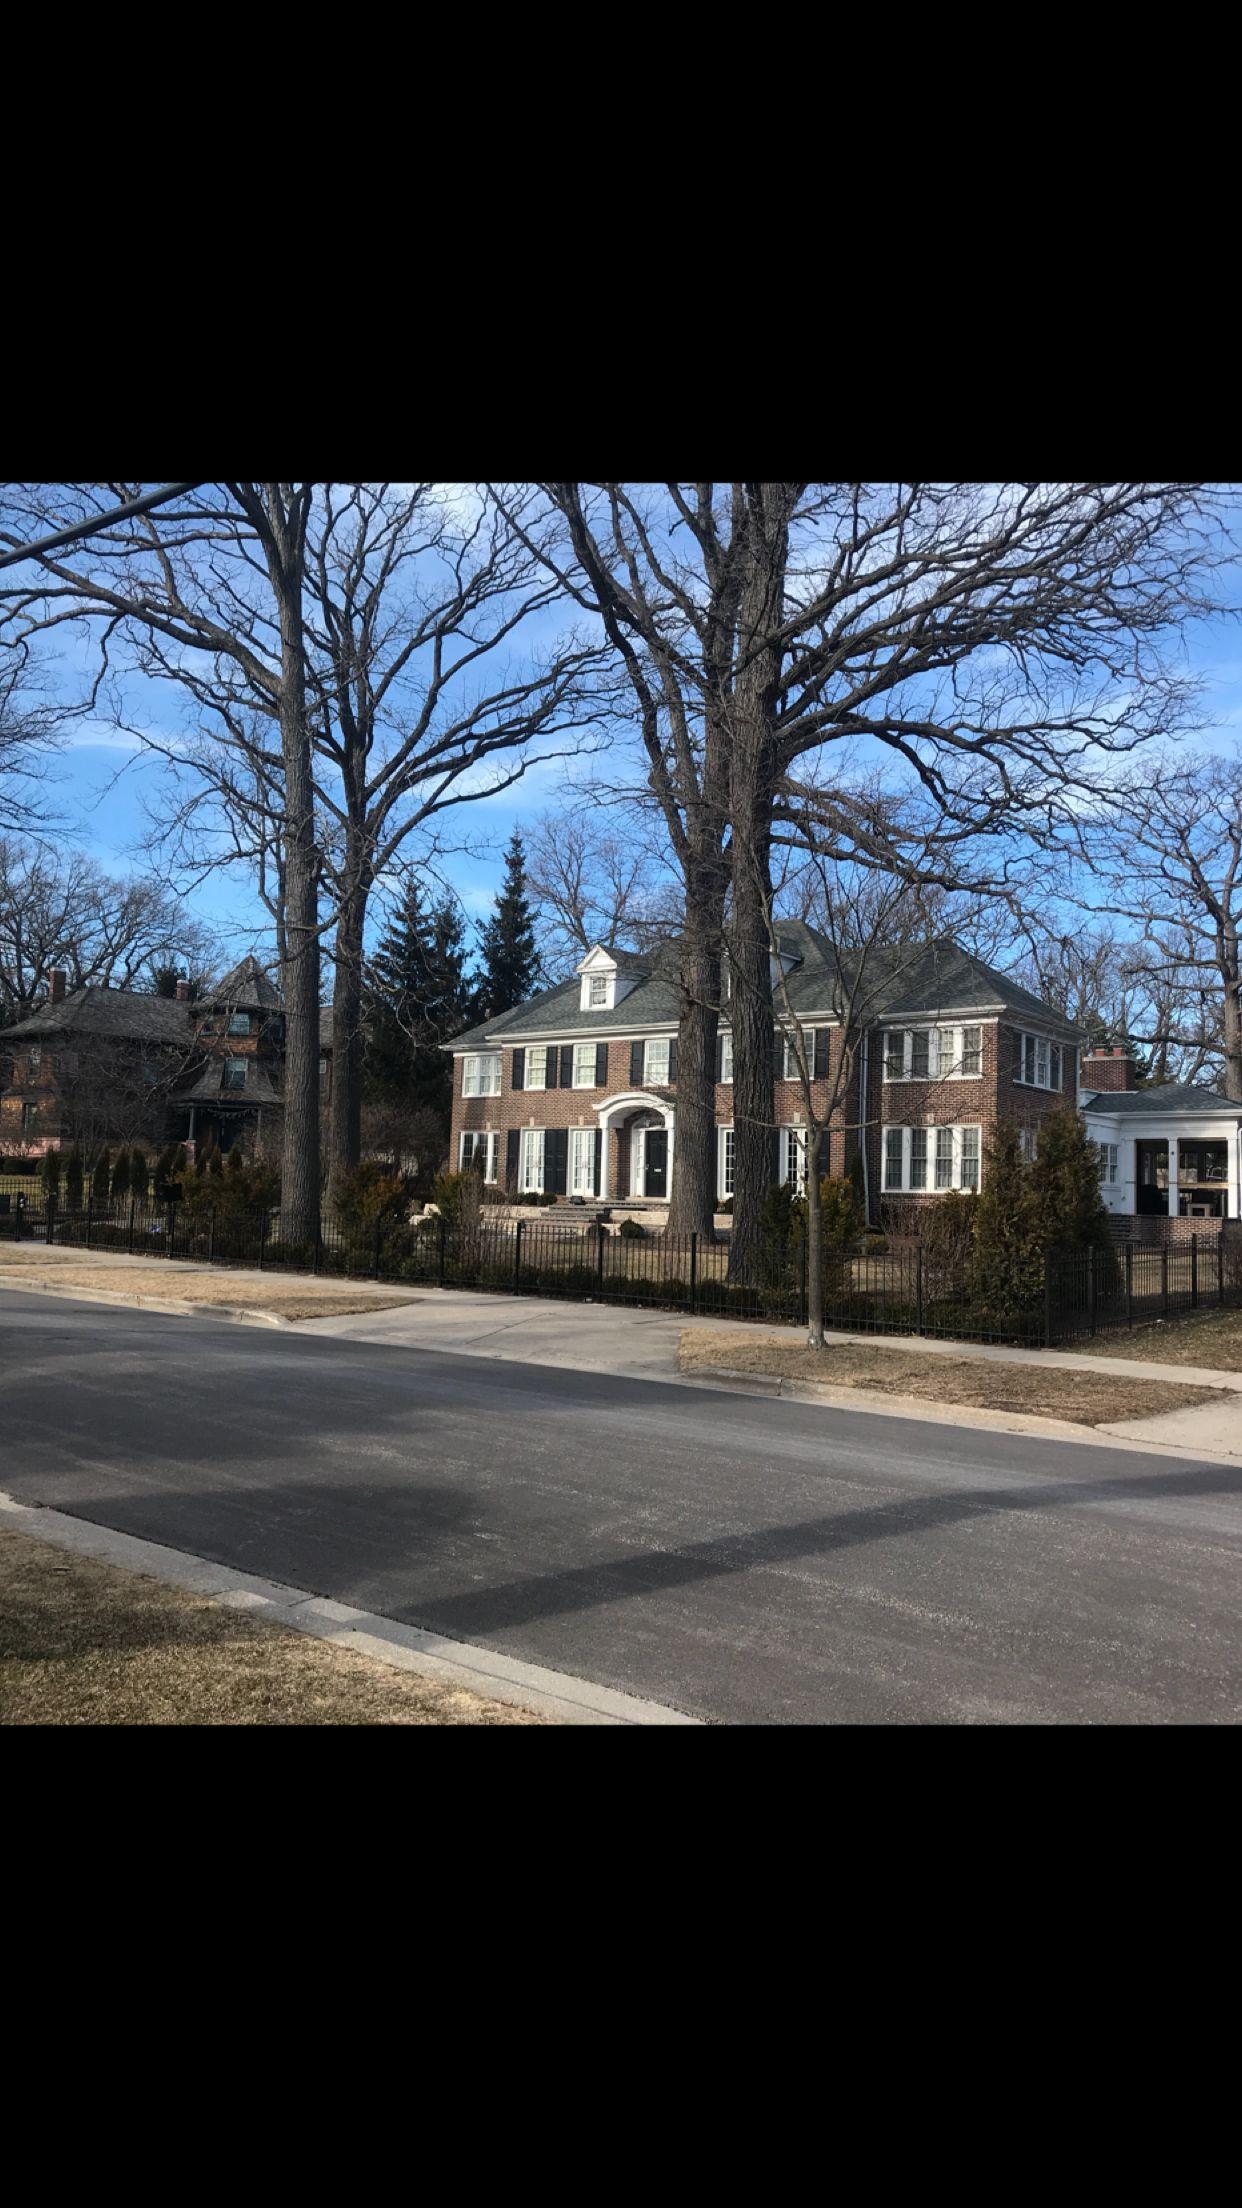 The Home Alone House in Winnetka, IL. | Chicago/Winnetka ...